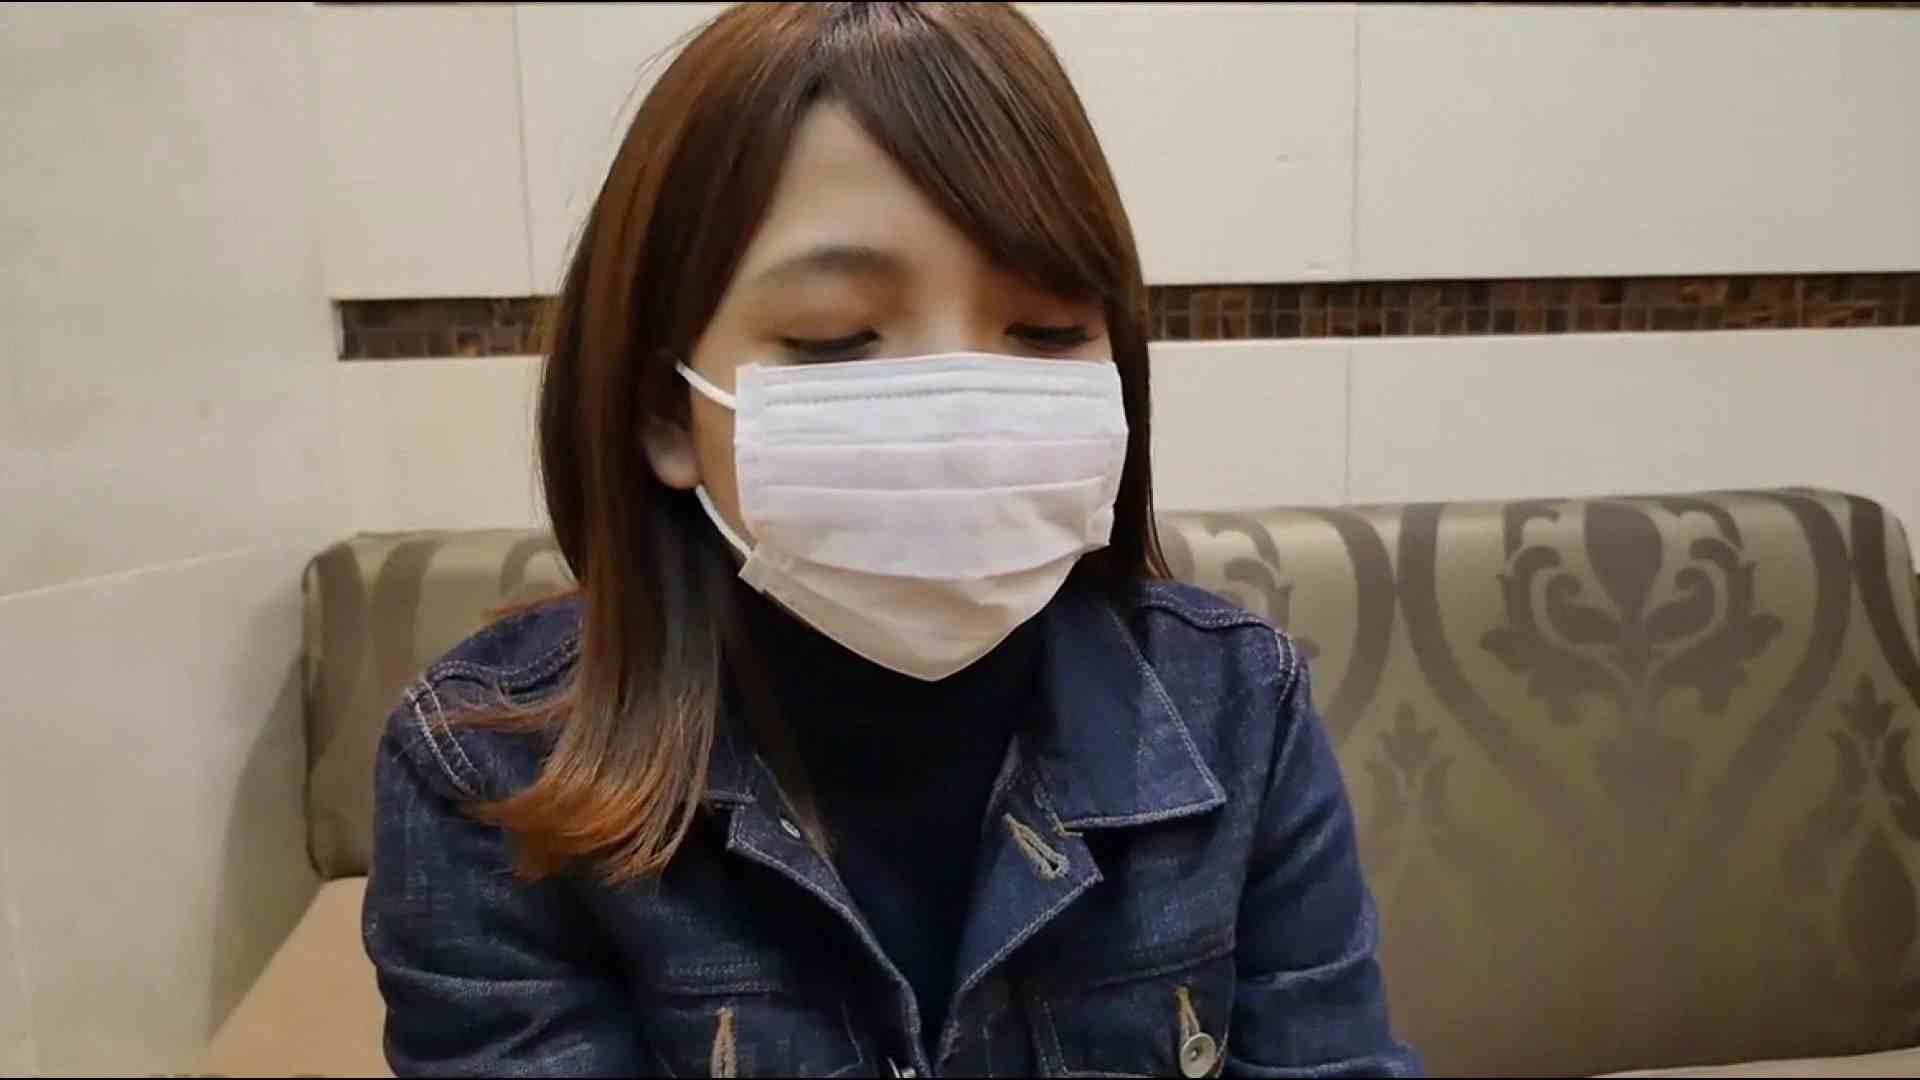 S級厳選美女ビッチガールVol.41 前編 モデル | 美女丸裸  99pic 28